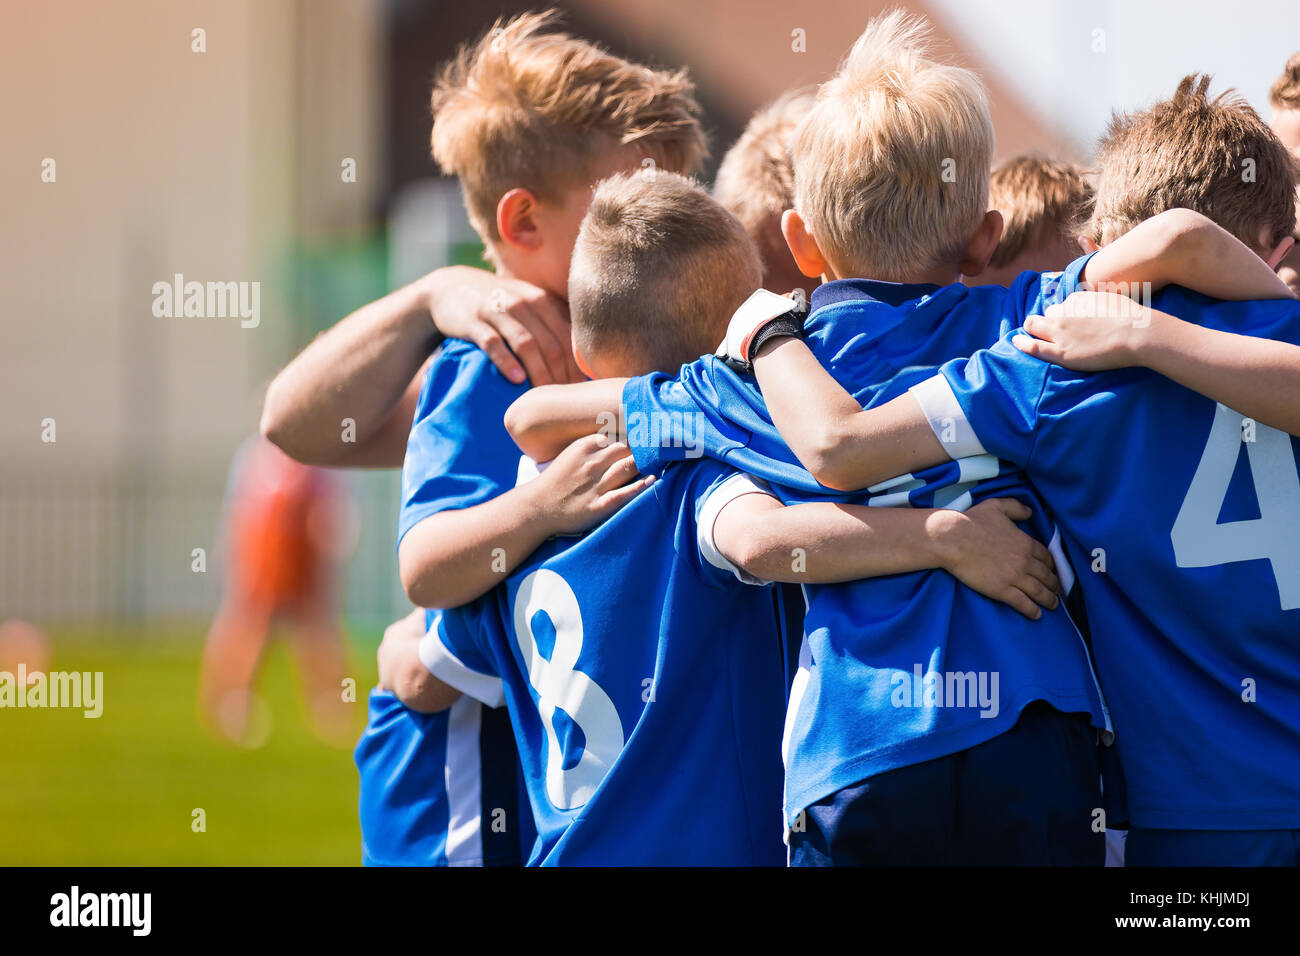 Kids Play Sports. Children Sports Team United Ready to Play Game. Children Team Sport. Youth Sports For Children. - Stock Image